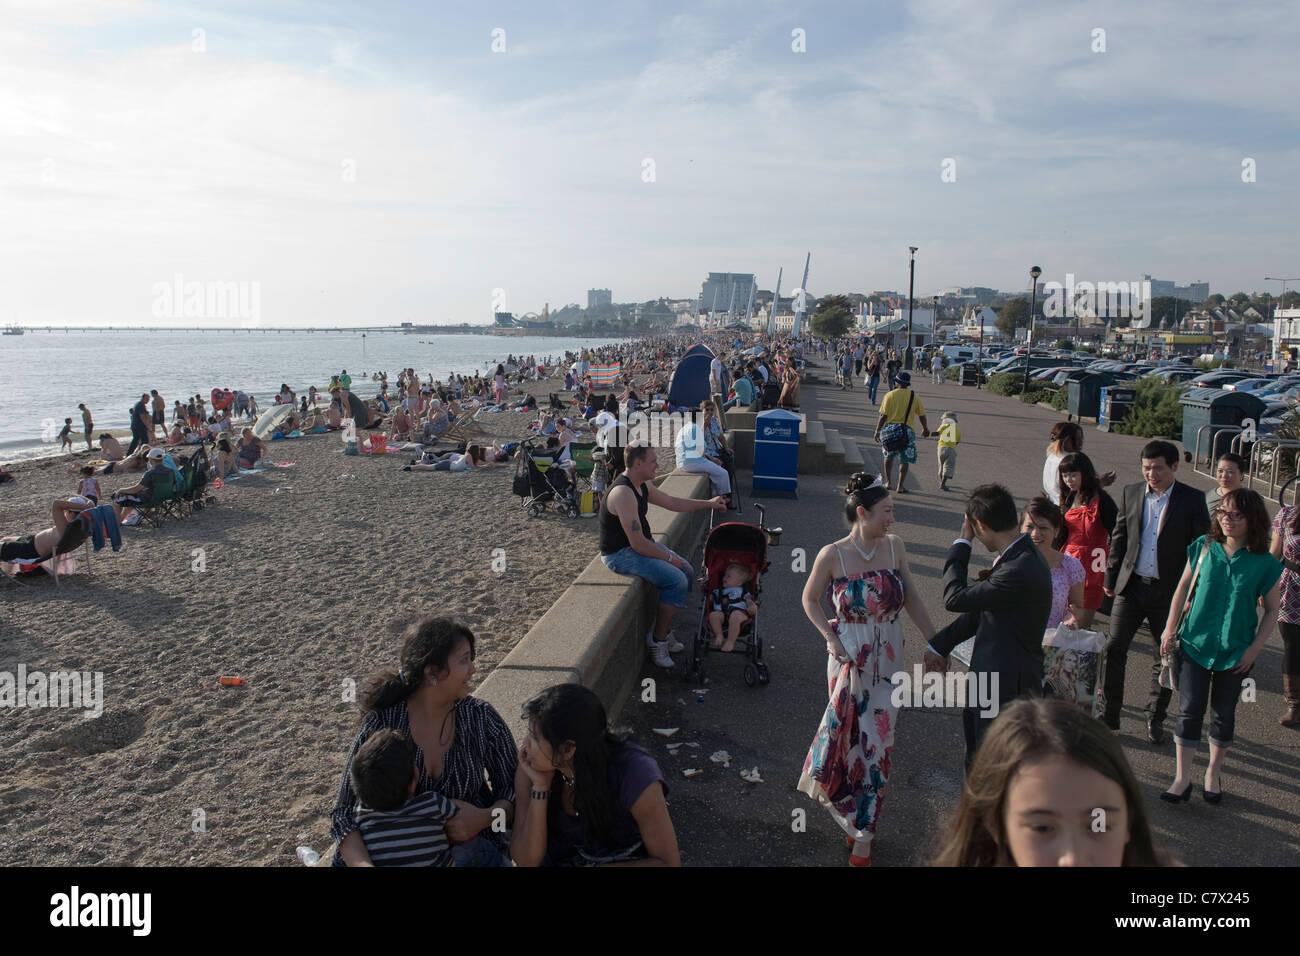 Southend-on-sea heatwave October 2011 - Stock Image